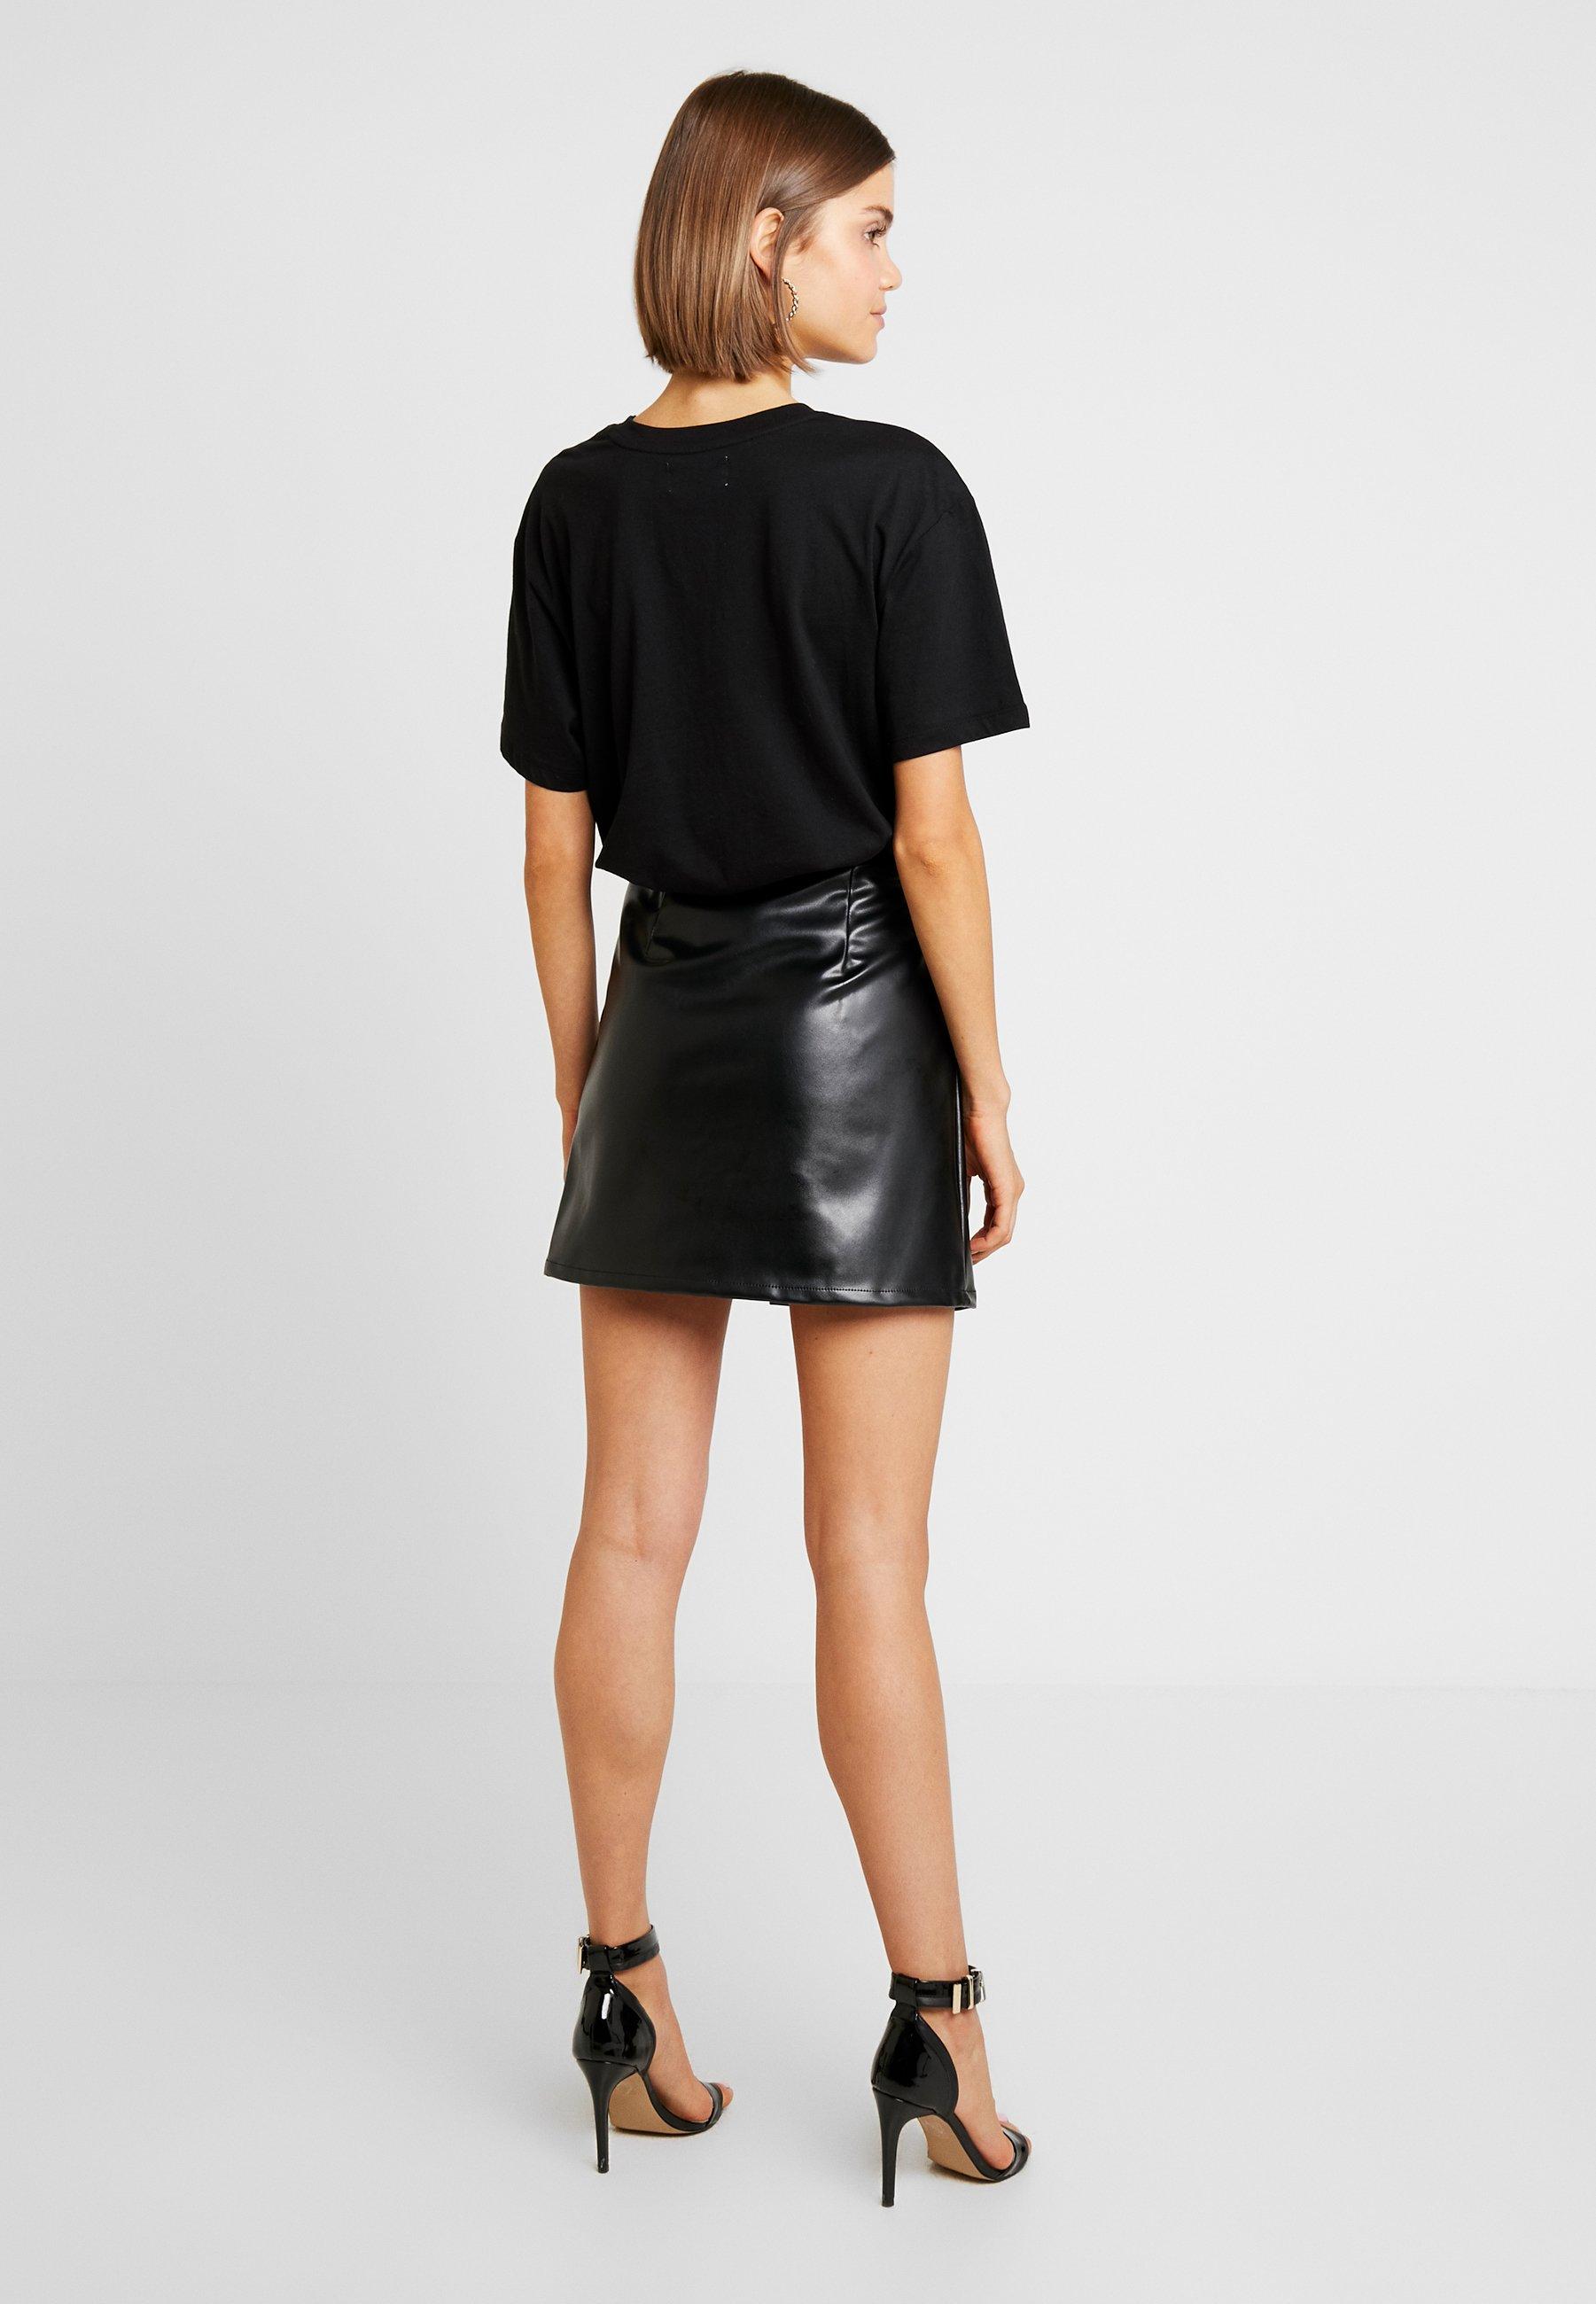 A Campana kd Black Na Wrap SkirtGonna Buttoned XTkiuZOP